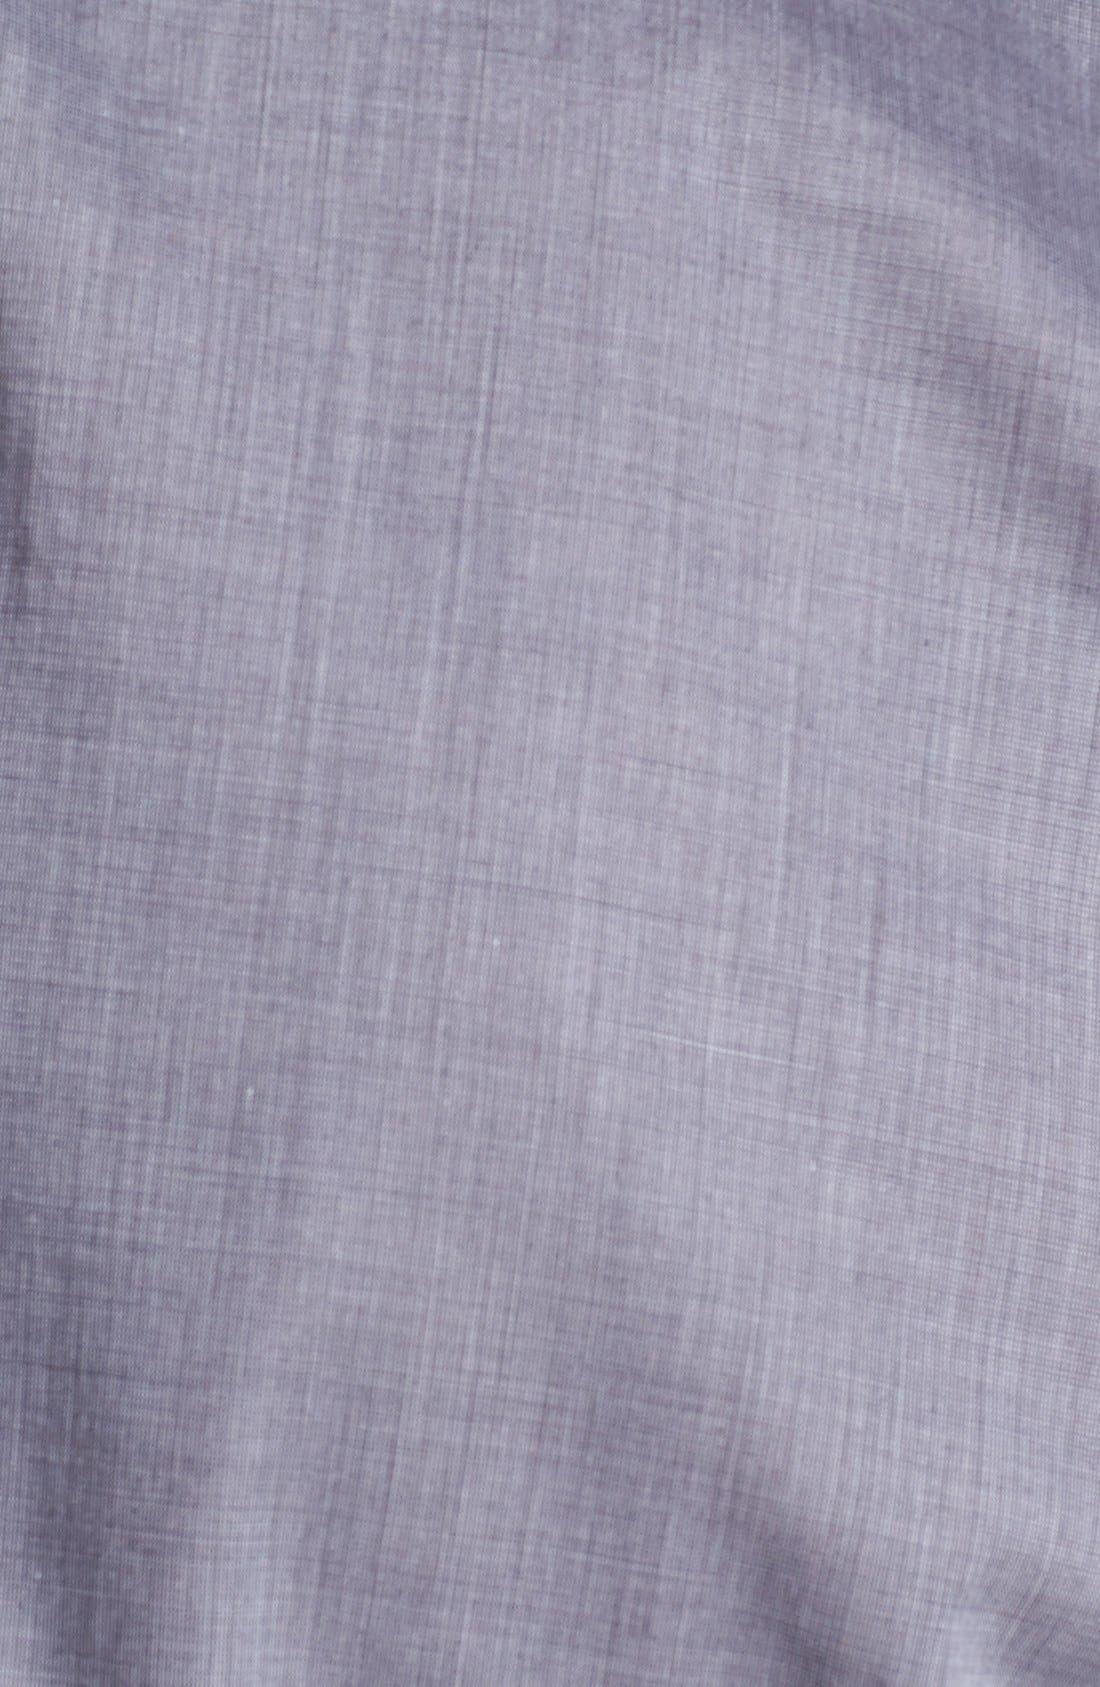 Alternate Image 2  - John Varvatos Collection Slim Fit Cotton Woven Shirt